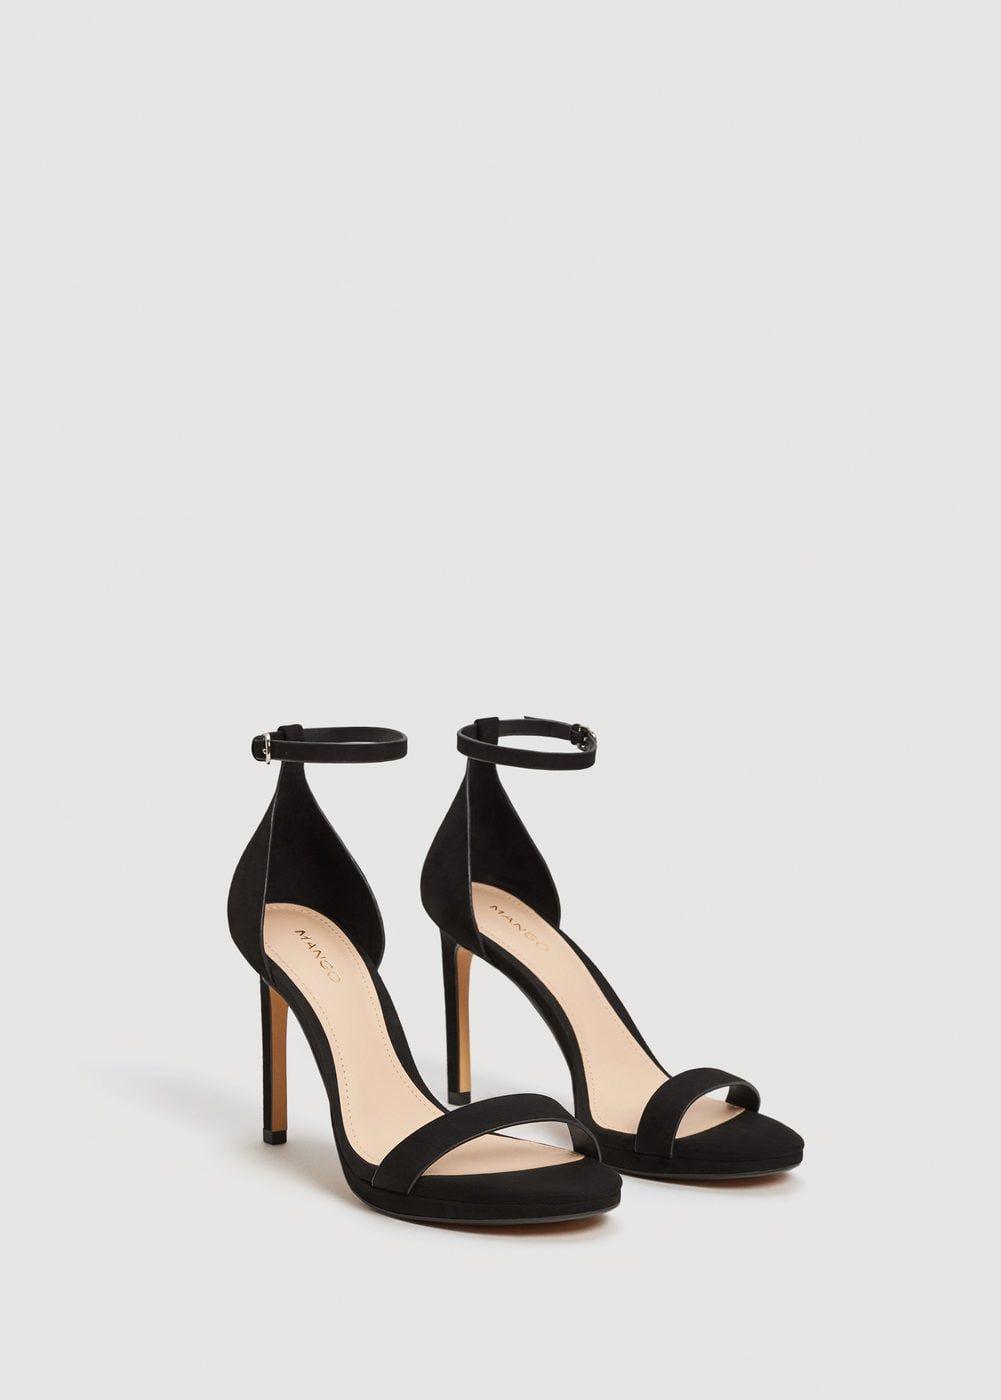 3301dbc2 Sandalia pulsera tobillo - Zapatos de Mujer | C@LZaDo ✓ | Pulseras ...